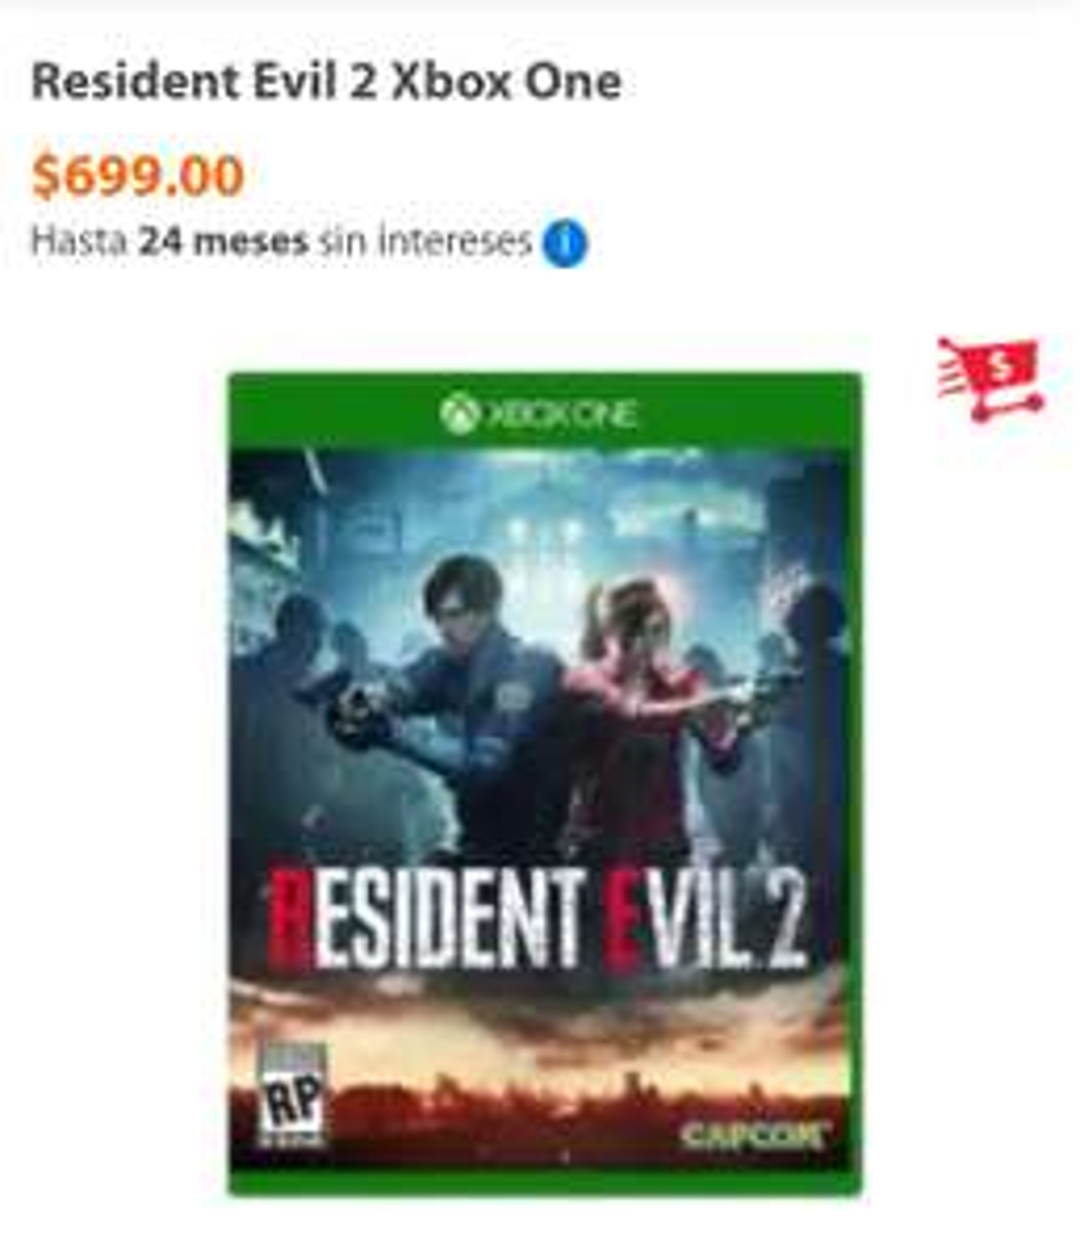 Walmart: Resident Evil 2 Xbox One